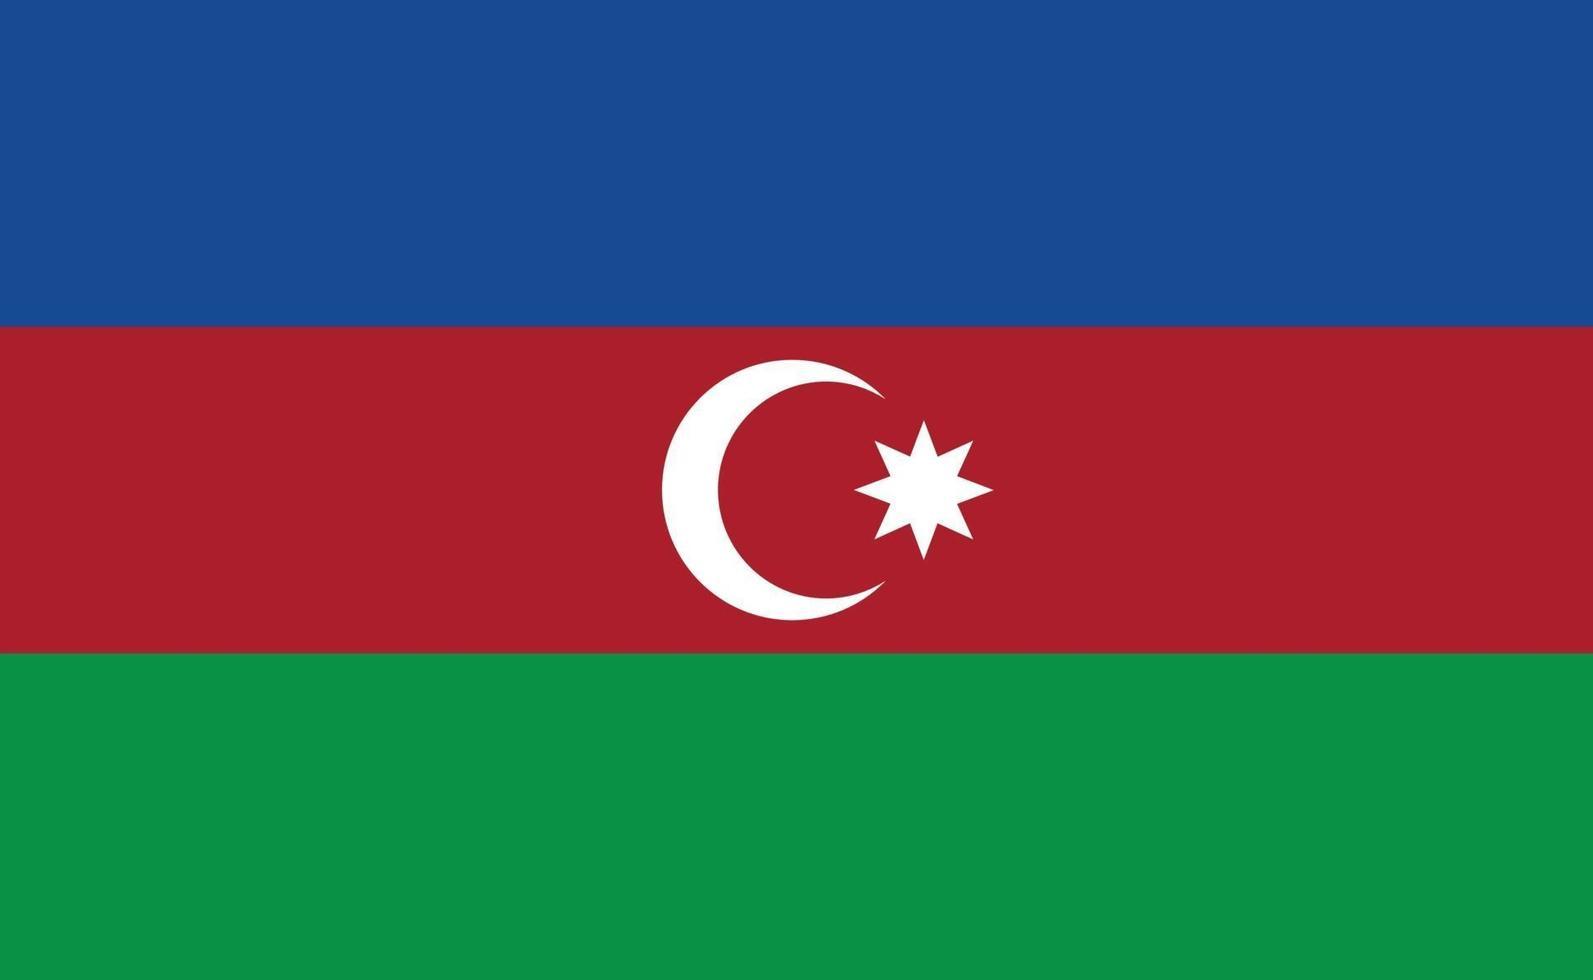 azerbajdzjans nationella flagga i exakta proportioner - vektorillustration vektor